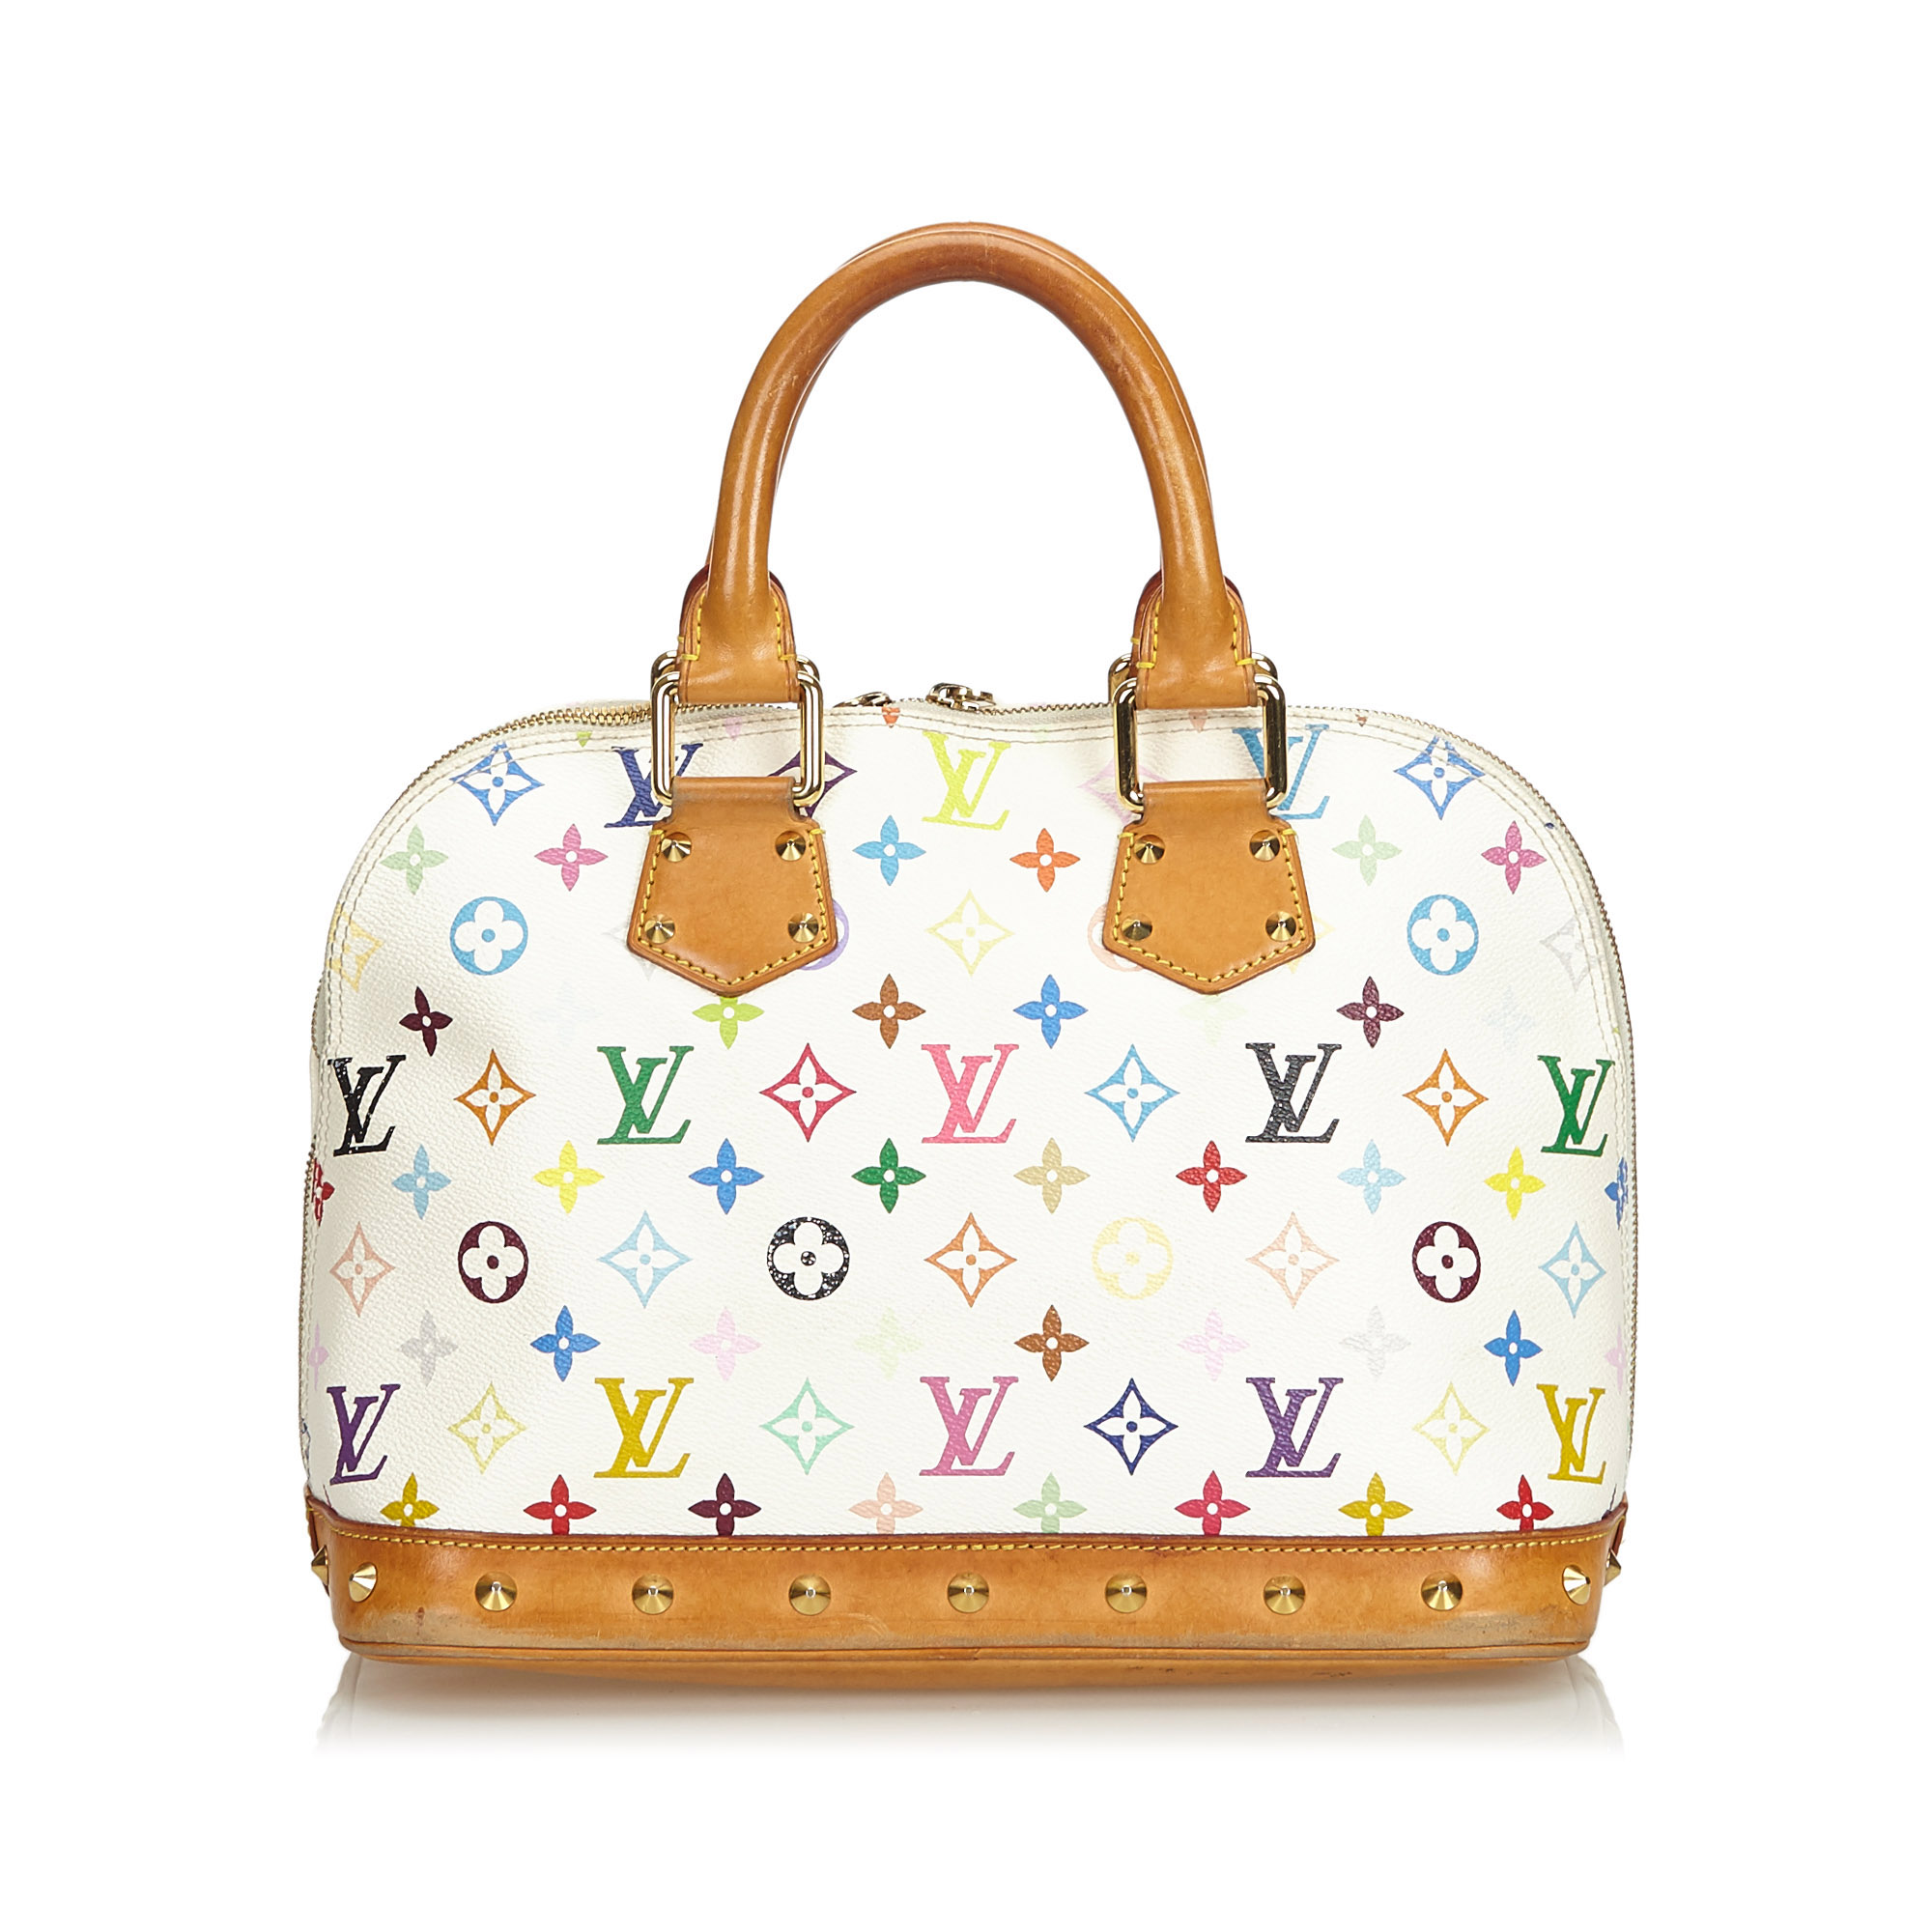 Louis Vuitton White Multicolor Monogram Alma Pm Bag